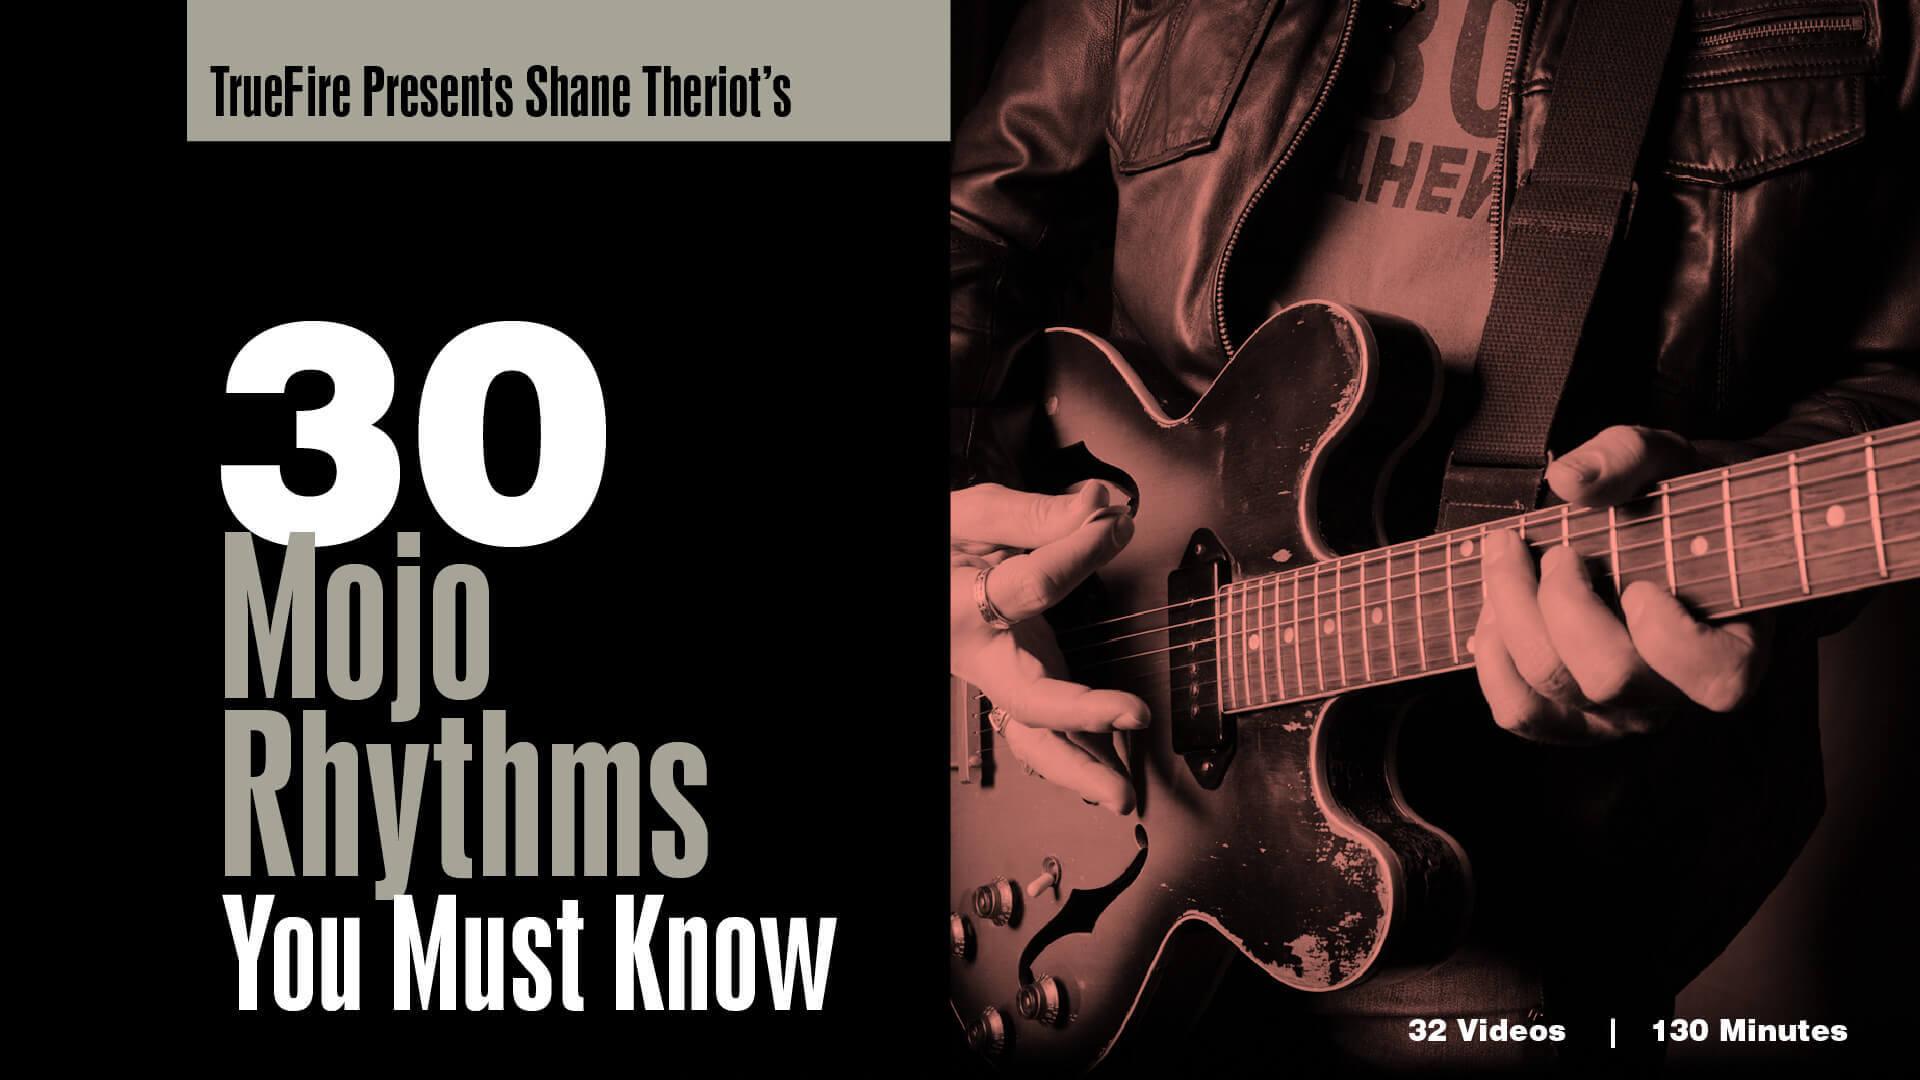 30 Mojo Rhythms Guitar Lessons Shane Theriot Truefire